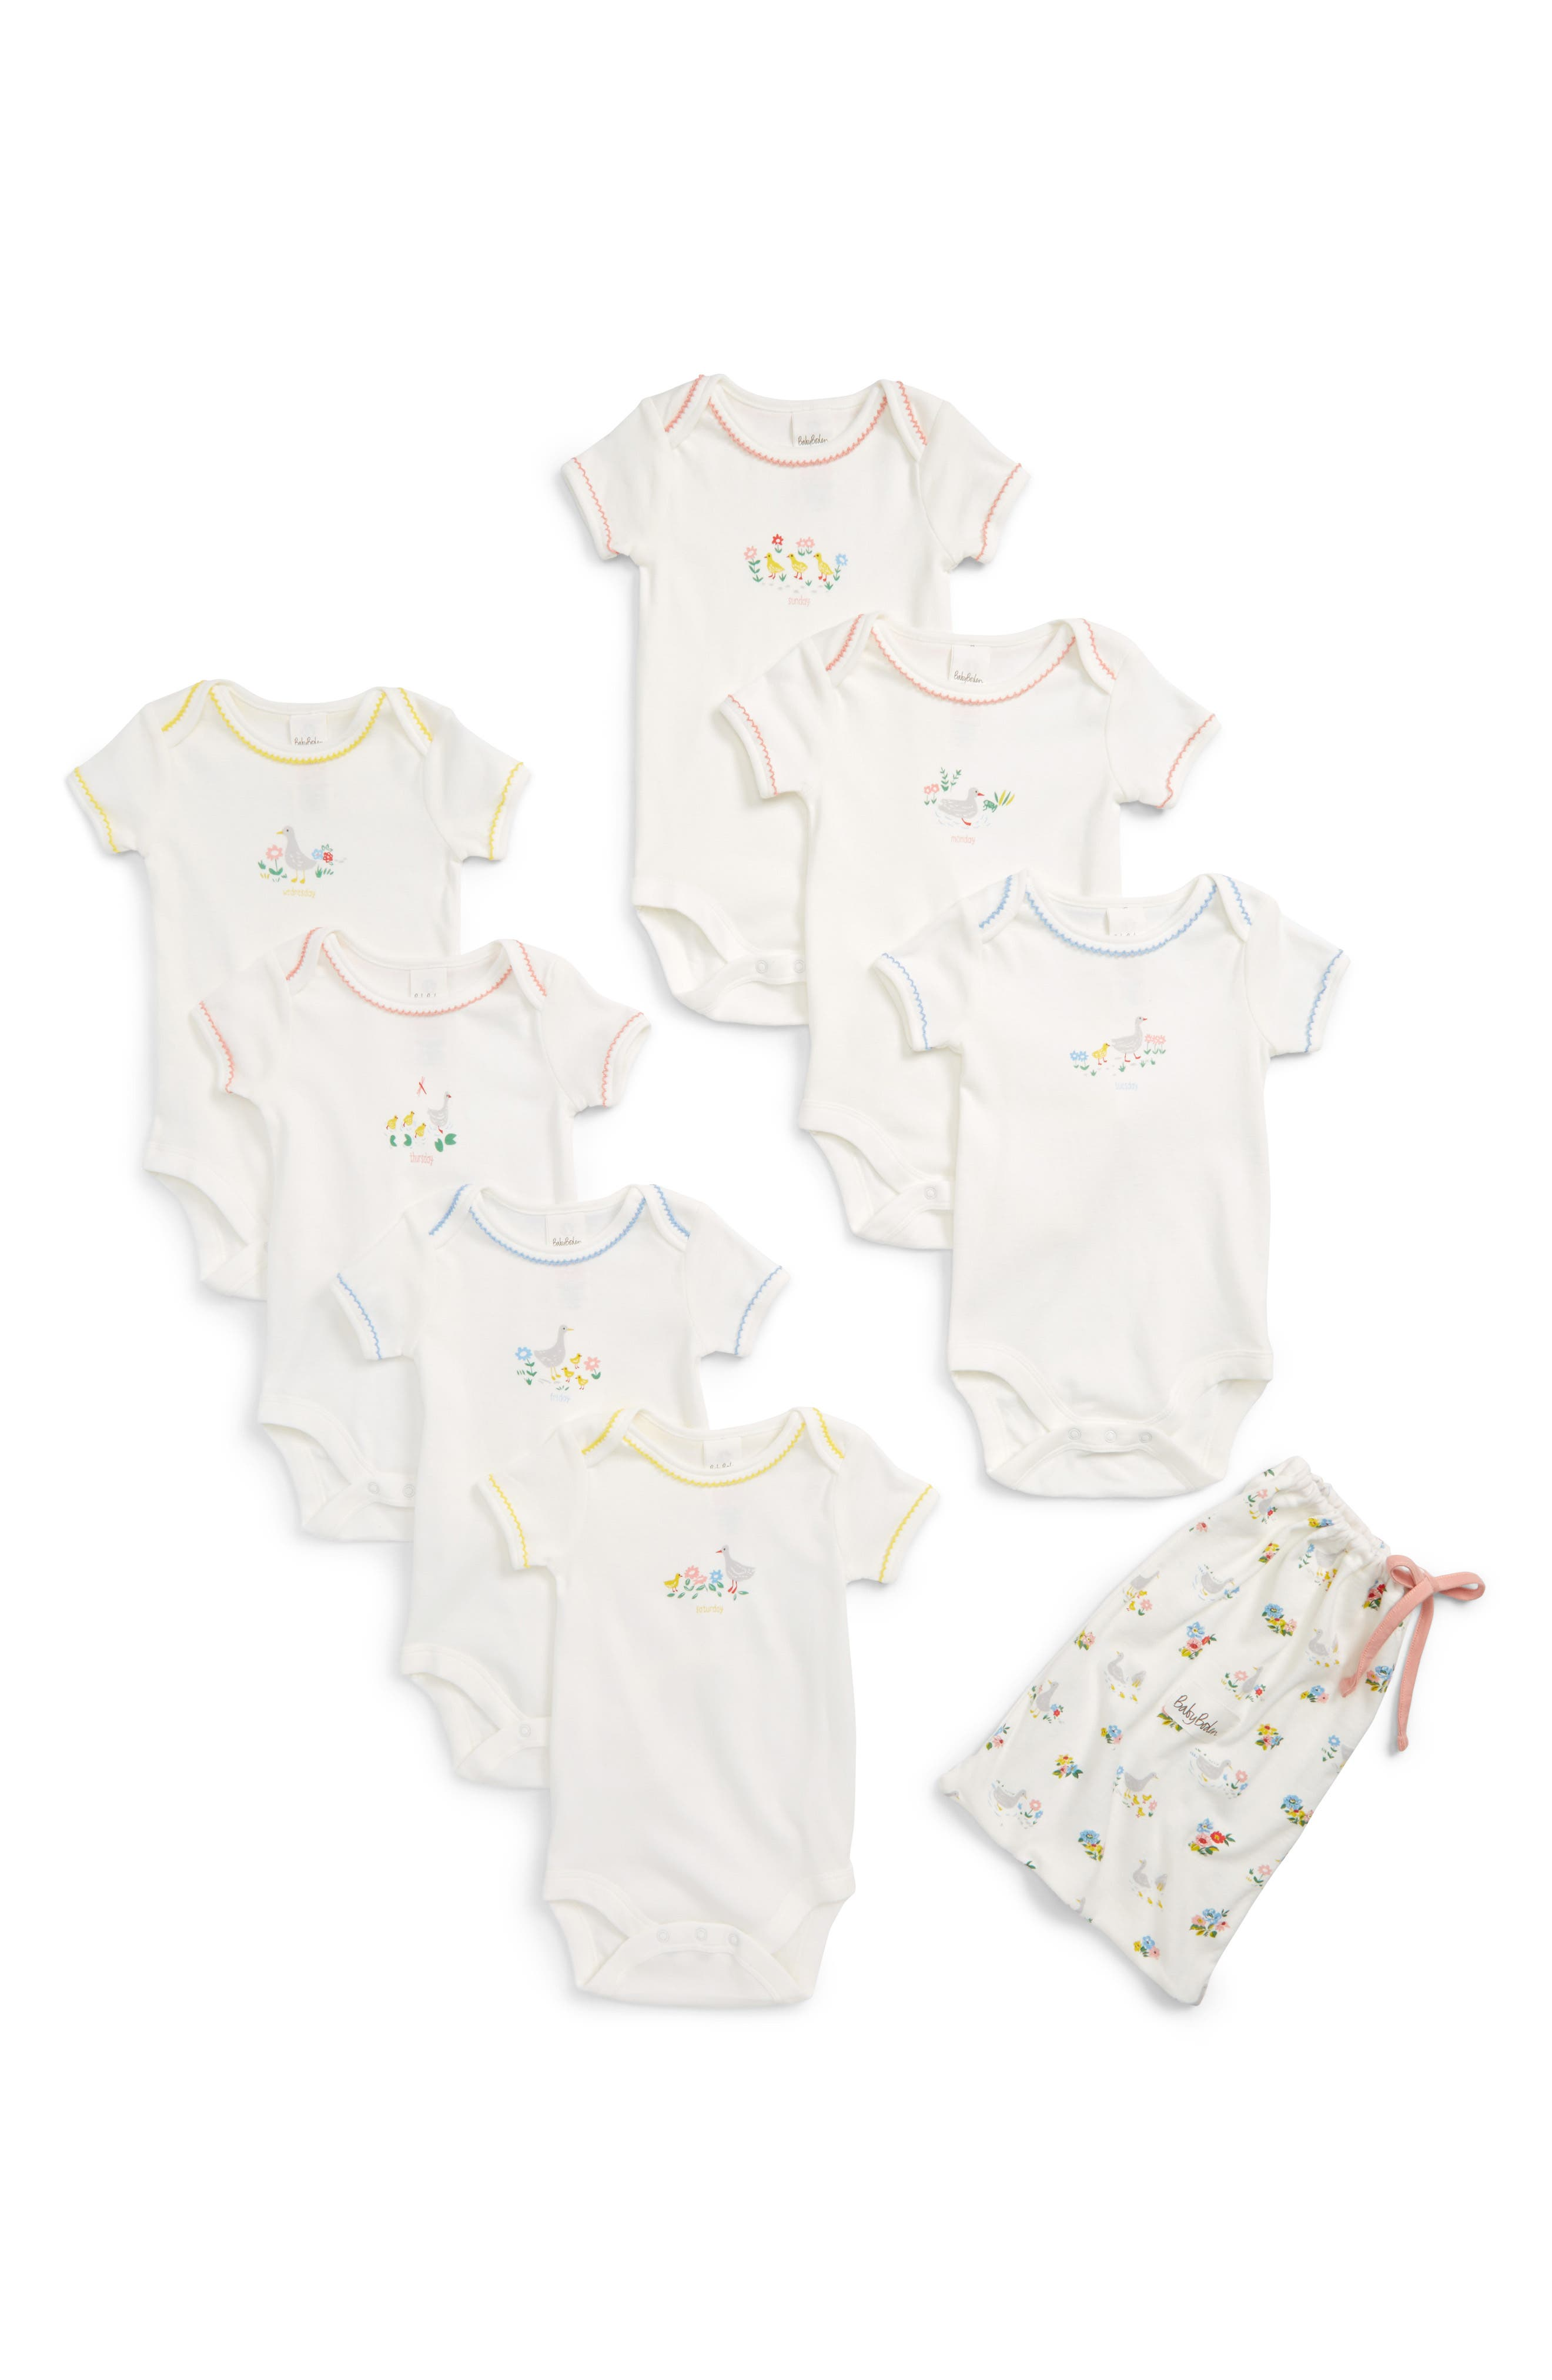 Mini Boden River Ducks Set of 7 Bodysuits (Baby)